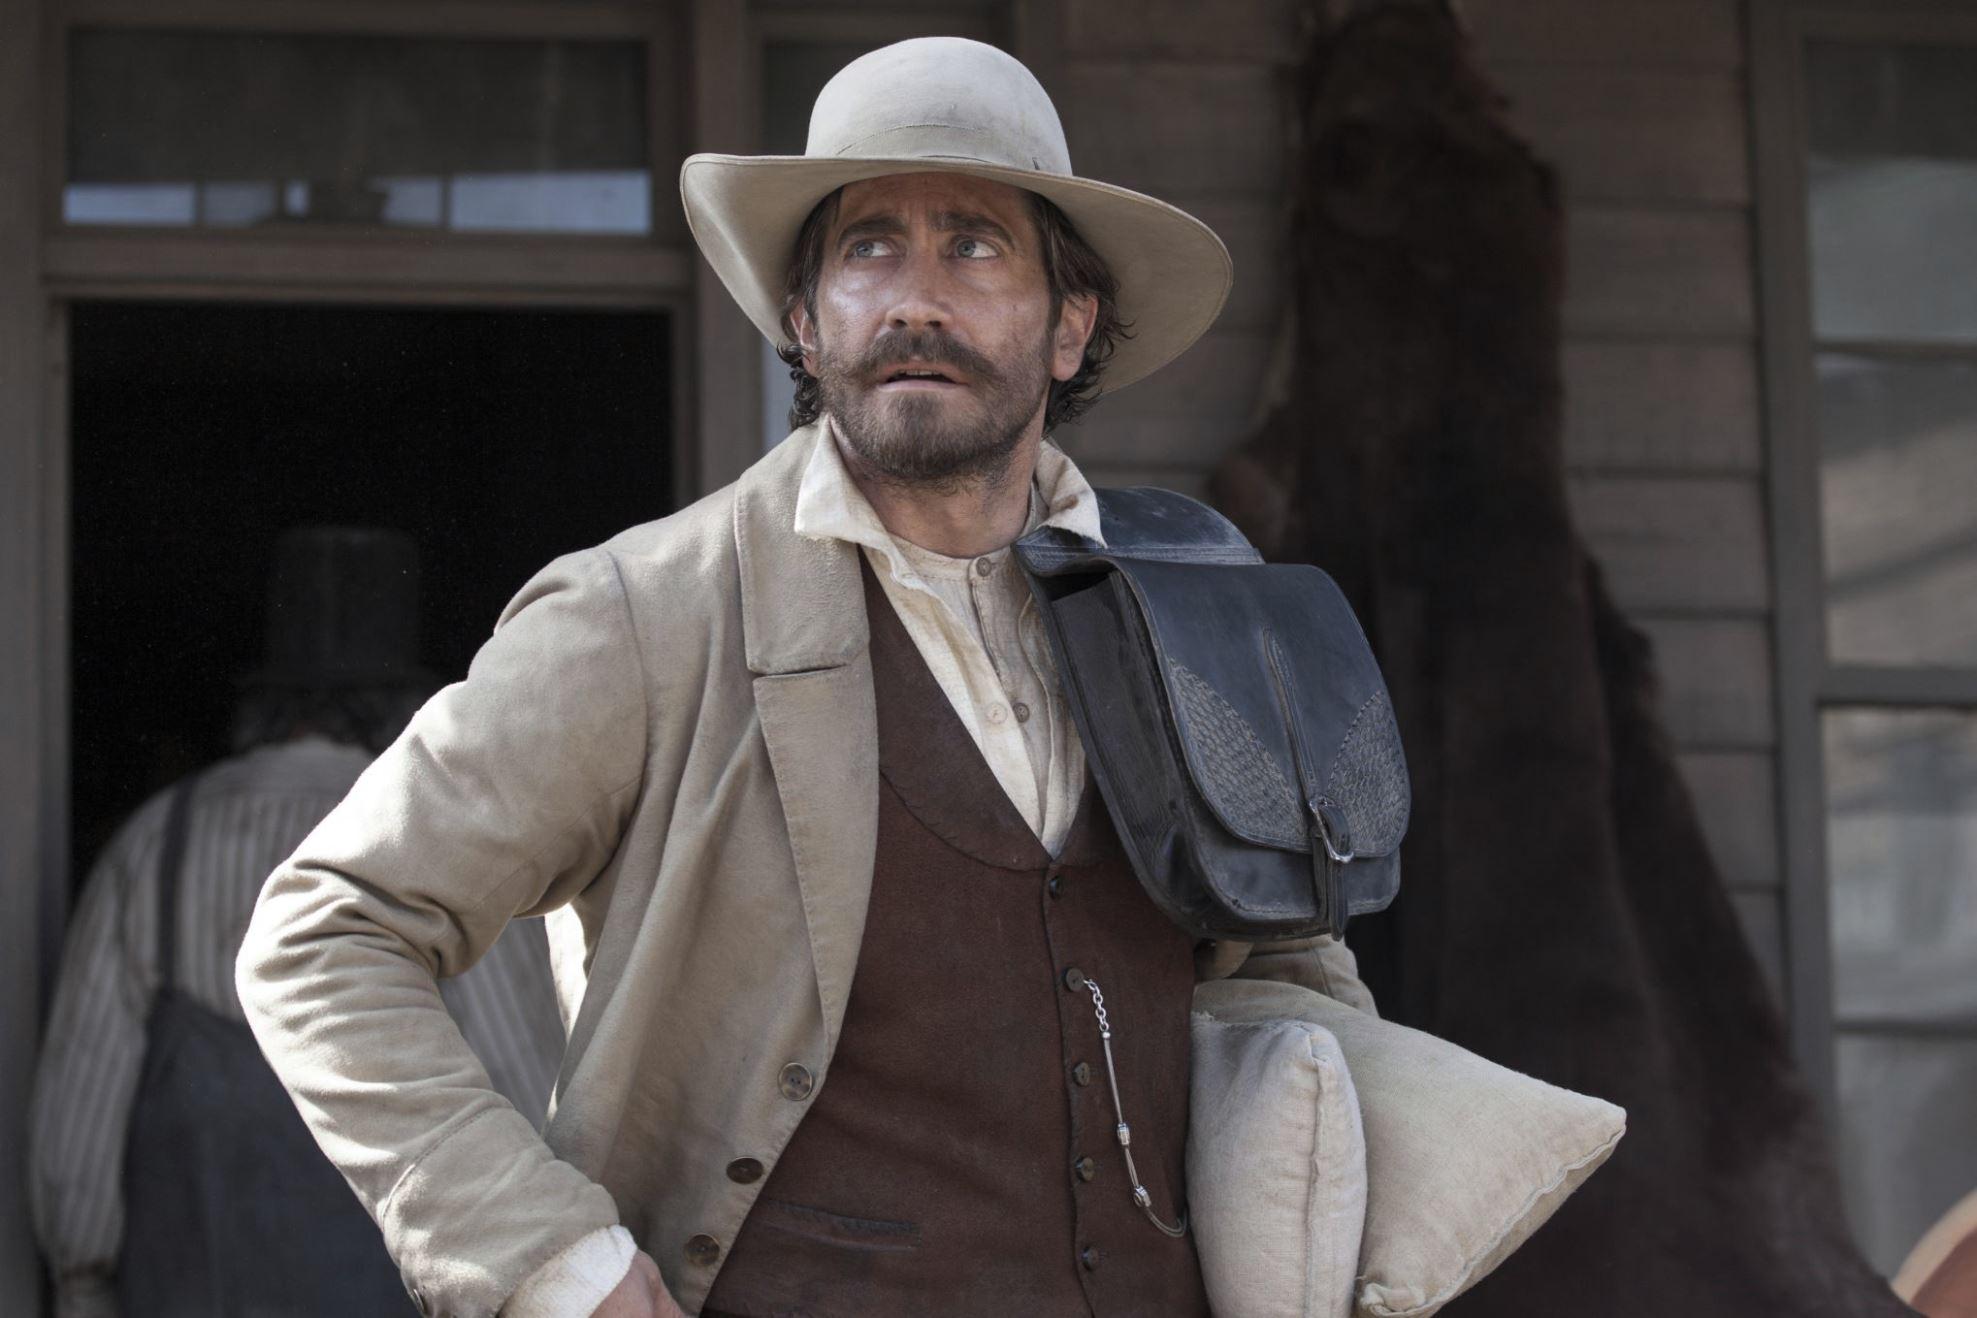 I fratelli Sisters: Jake Gyllenhaal in una scena del western